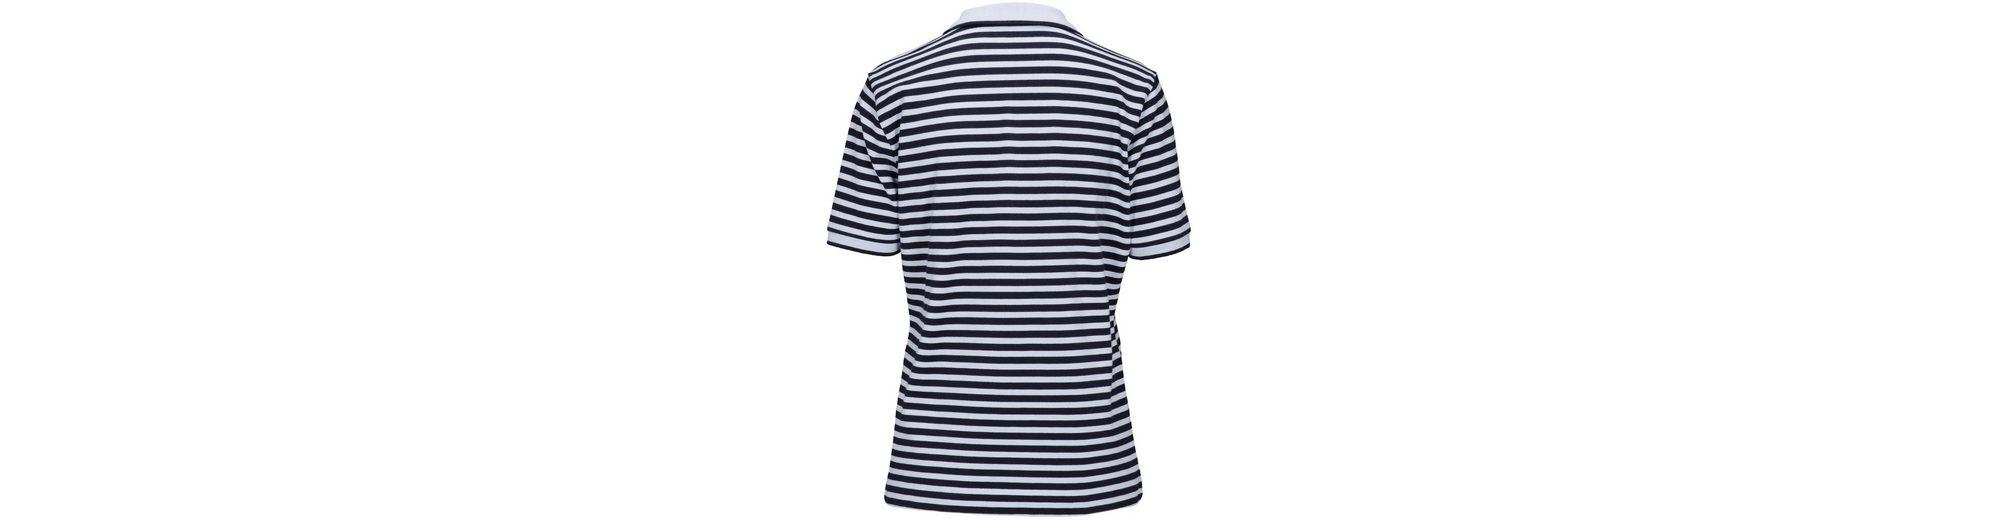 Design Design IN im LINEA IN Poloshirt im Poloshirt Poloshirt Design Streifen LINEA Streifen IN LINEA Streifen im 8a6wqgtA